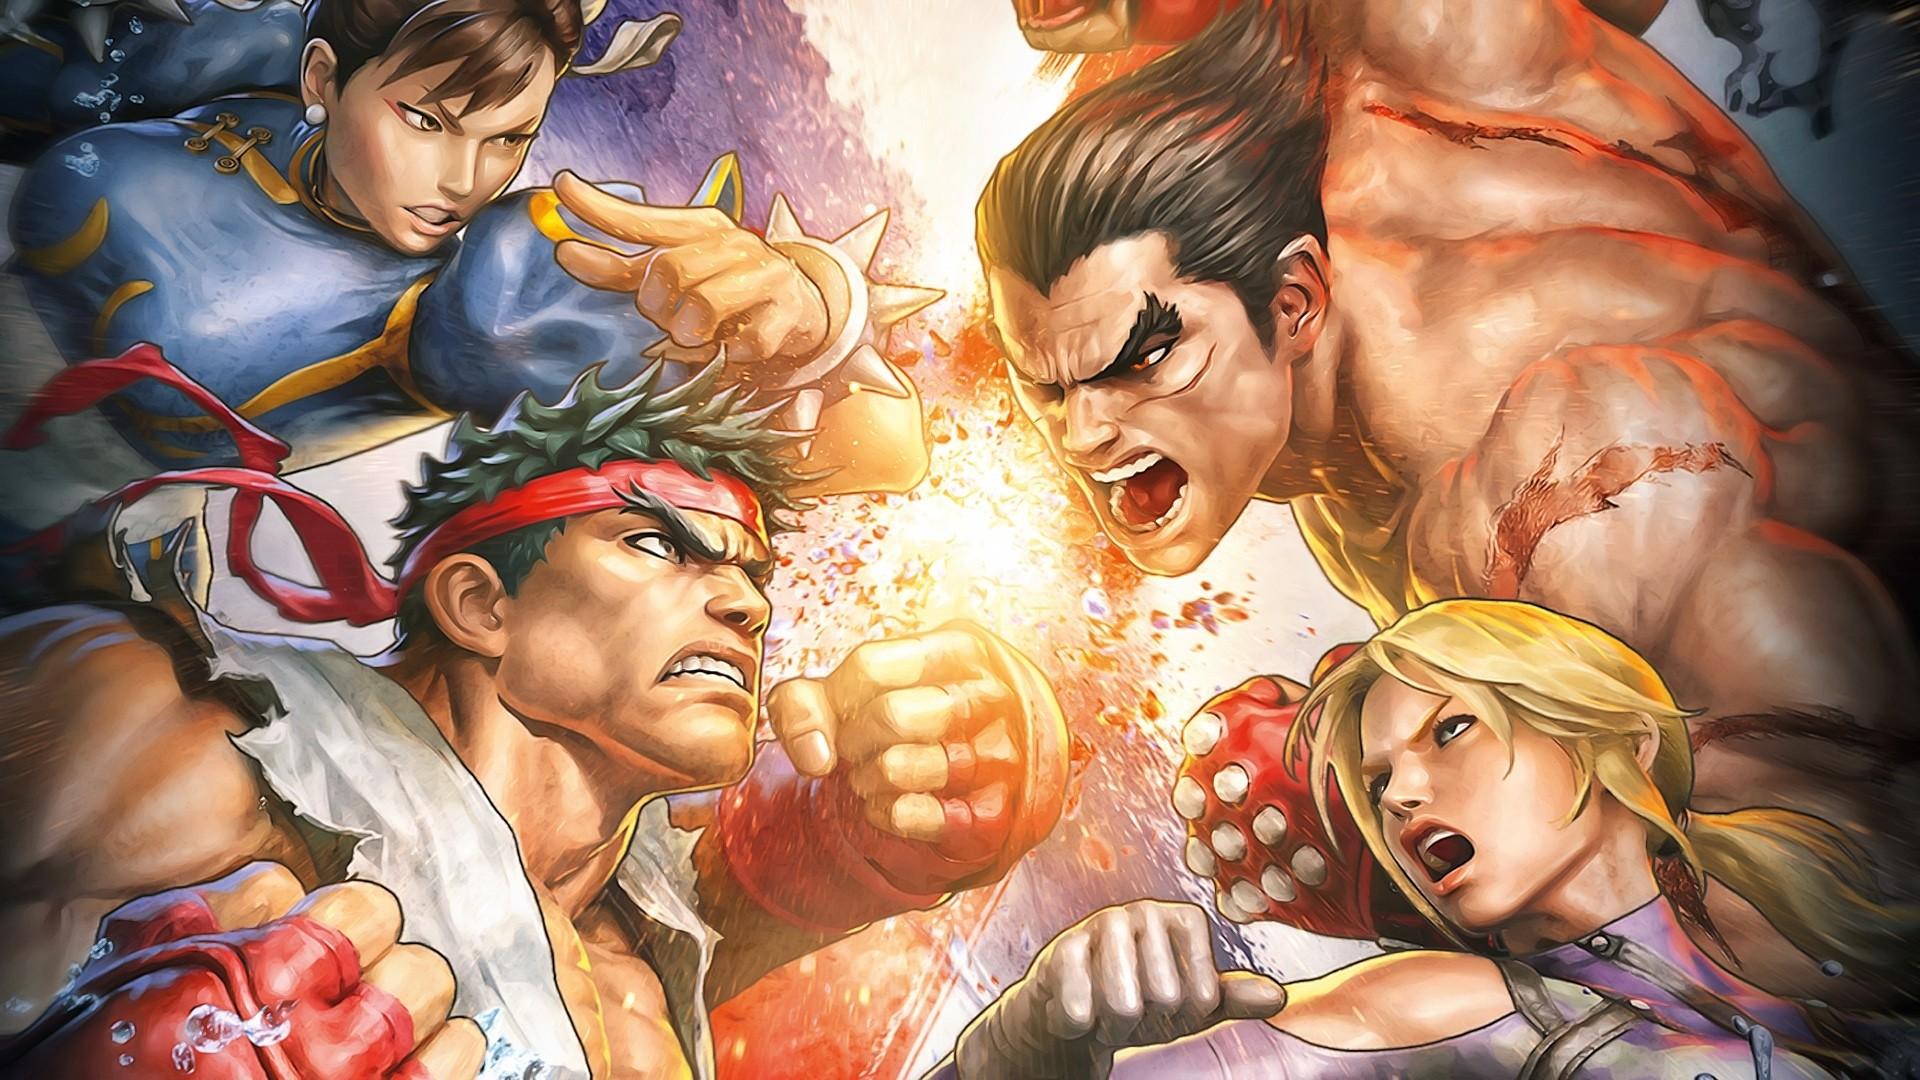 Wallpaper street fighter x tekken, chun-li, ryu, characters,  fighters